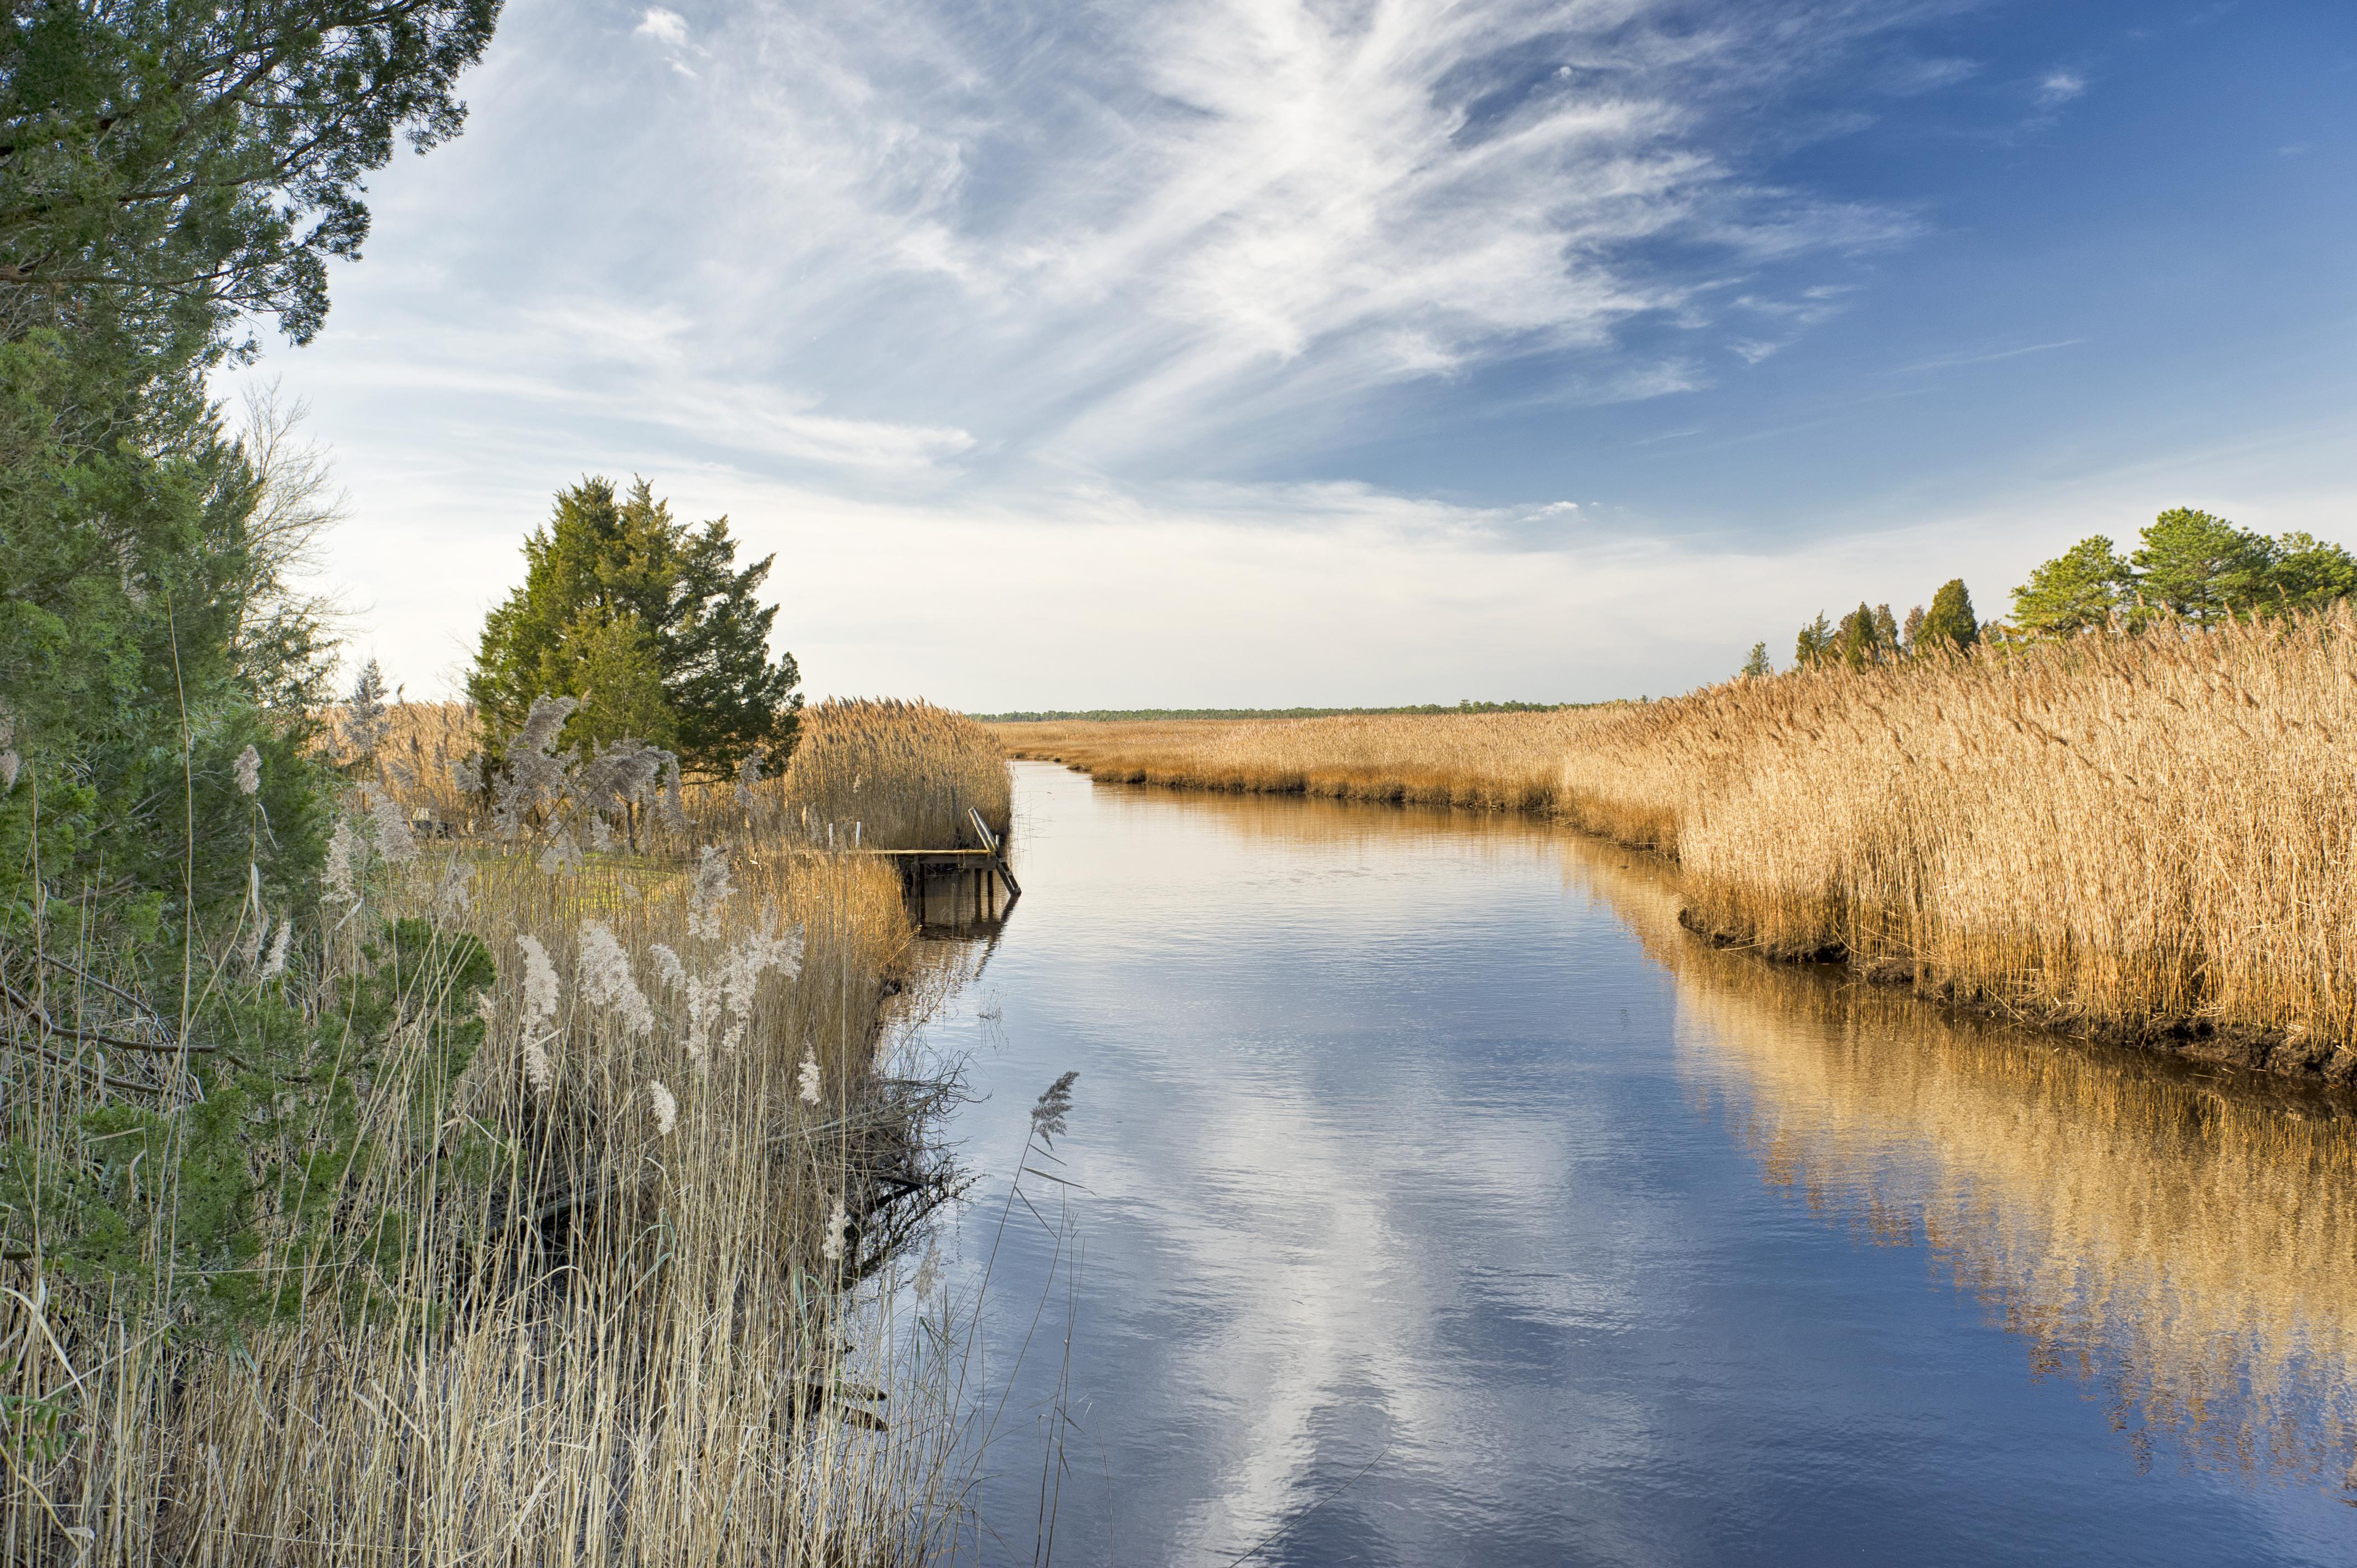 water_NJ_Pinelands_Small_Stream_Wetlands_450x299.jpg